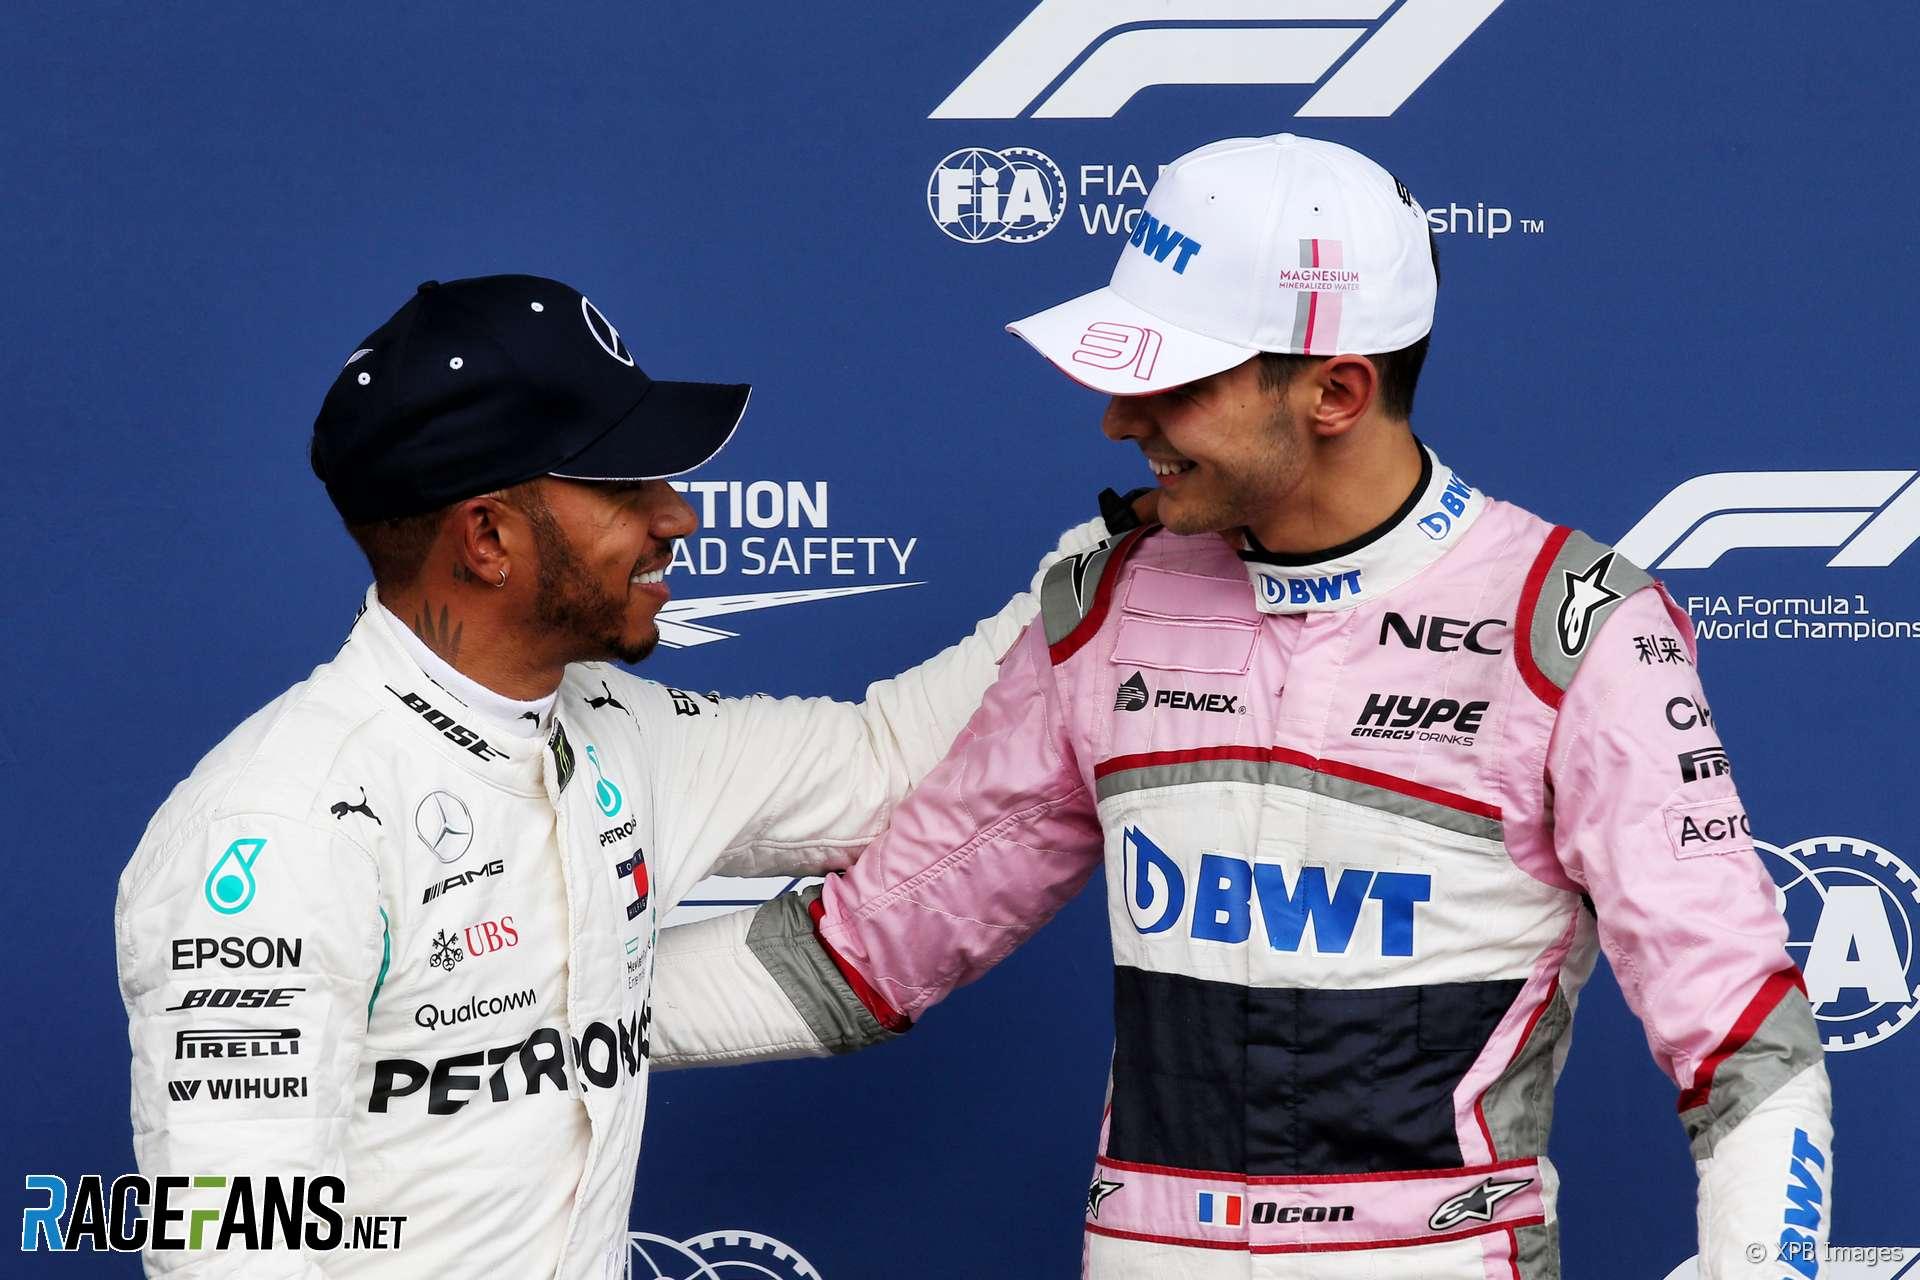 Lewis Hamilton, Esteban Ocon, Spa-Francorchamps, 2018